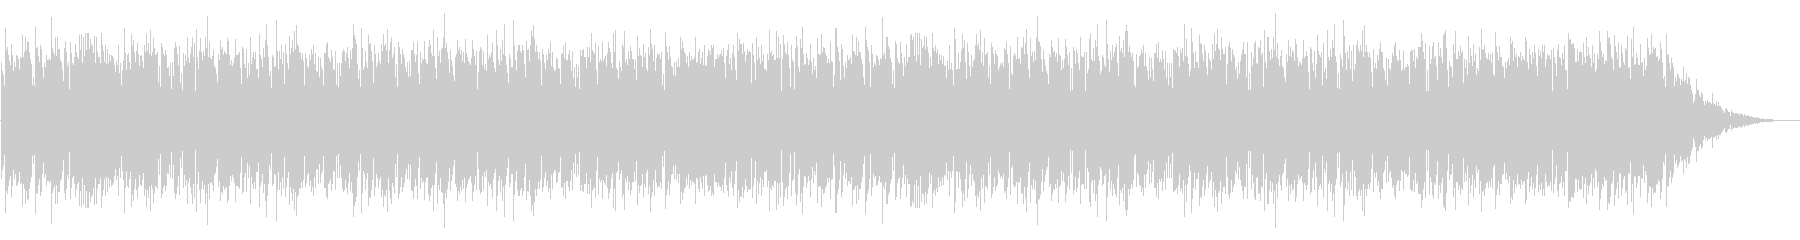 NES アクションC05-1(ステージ3の未再生の波形